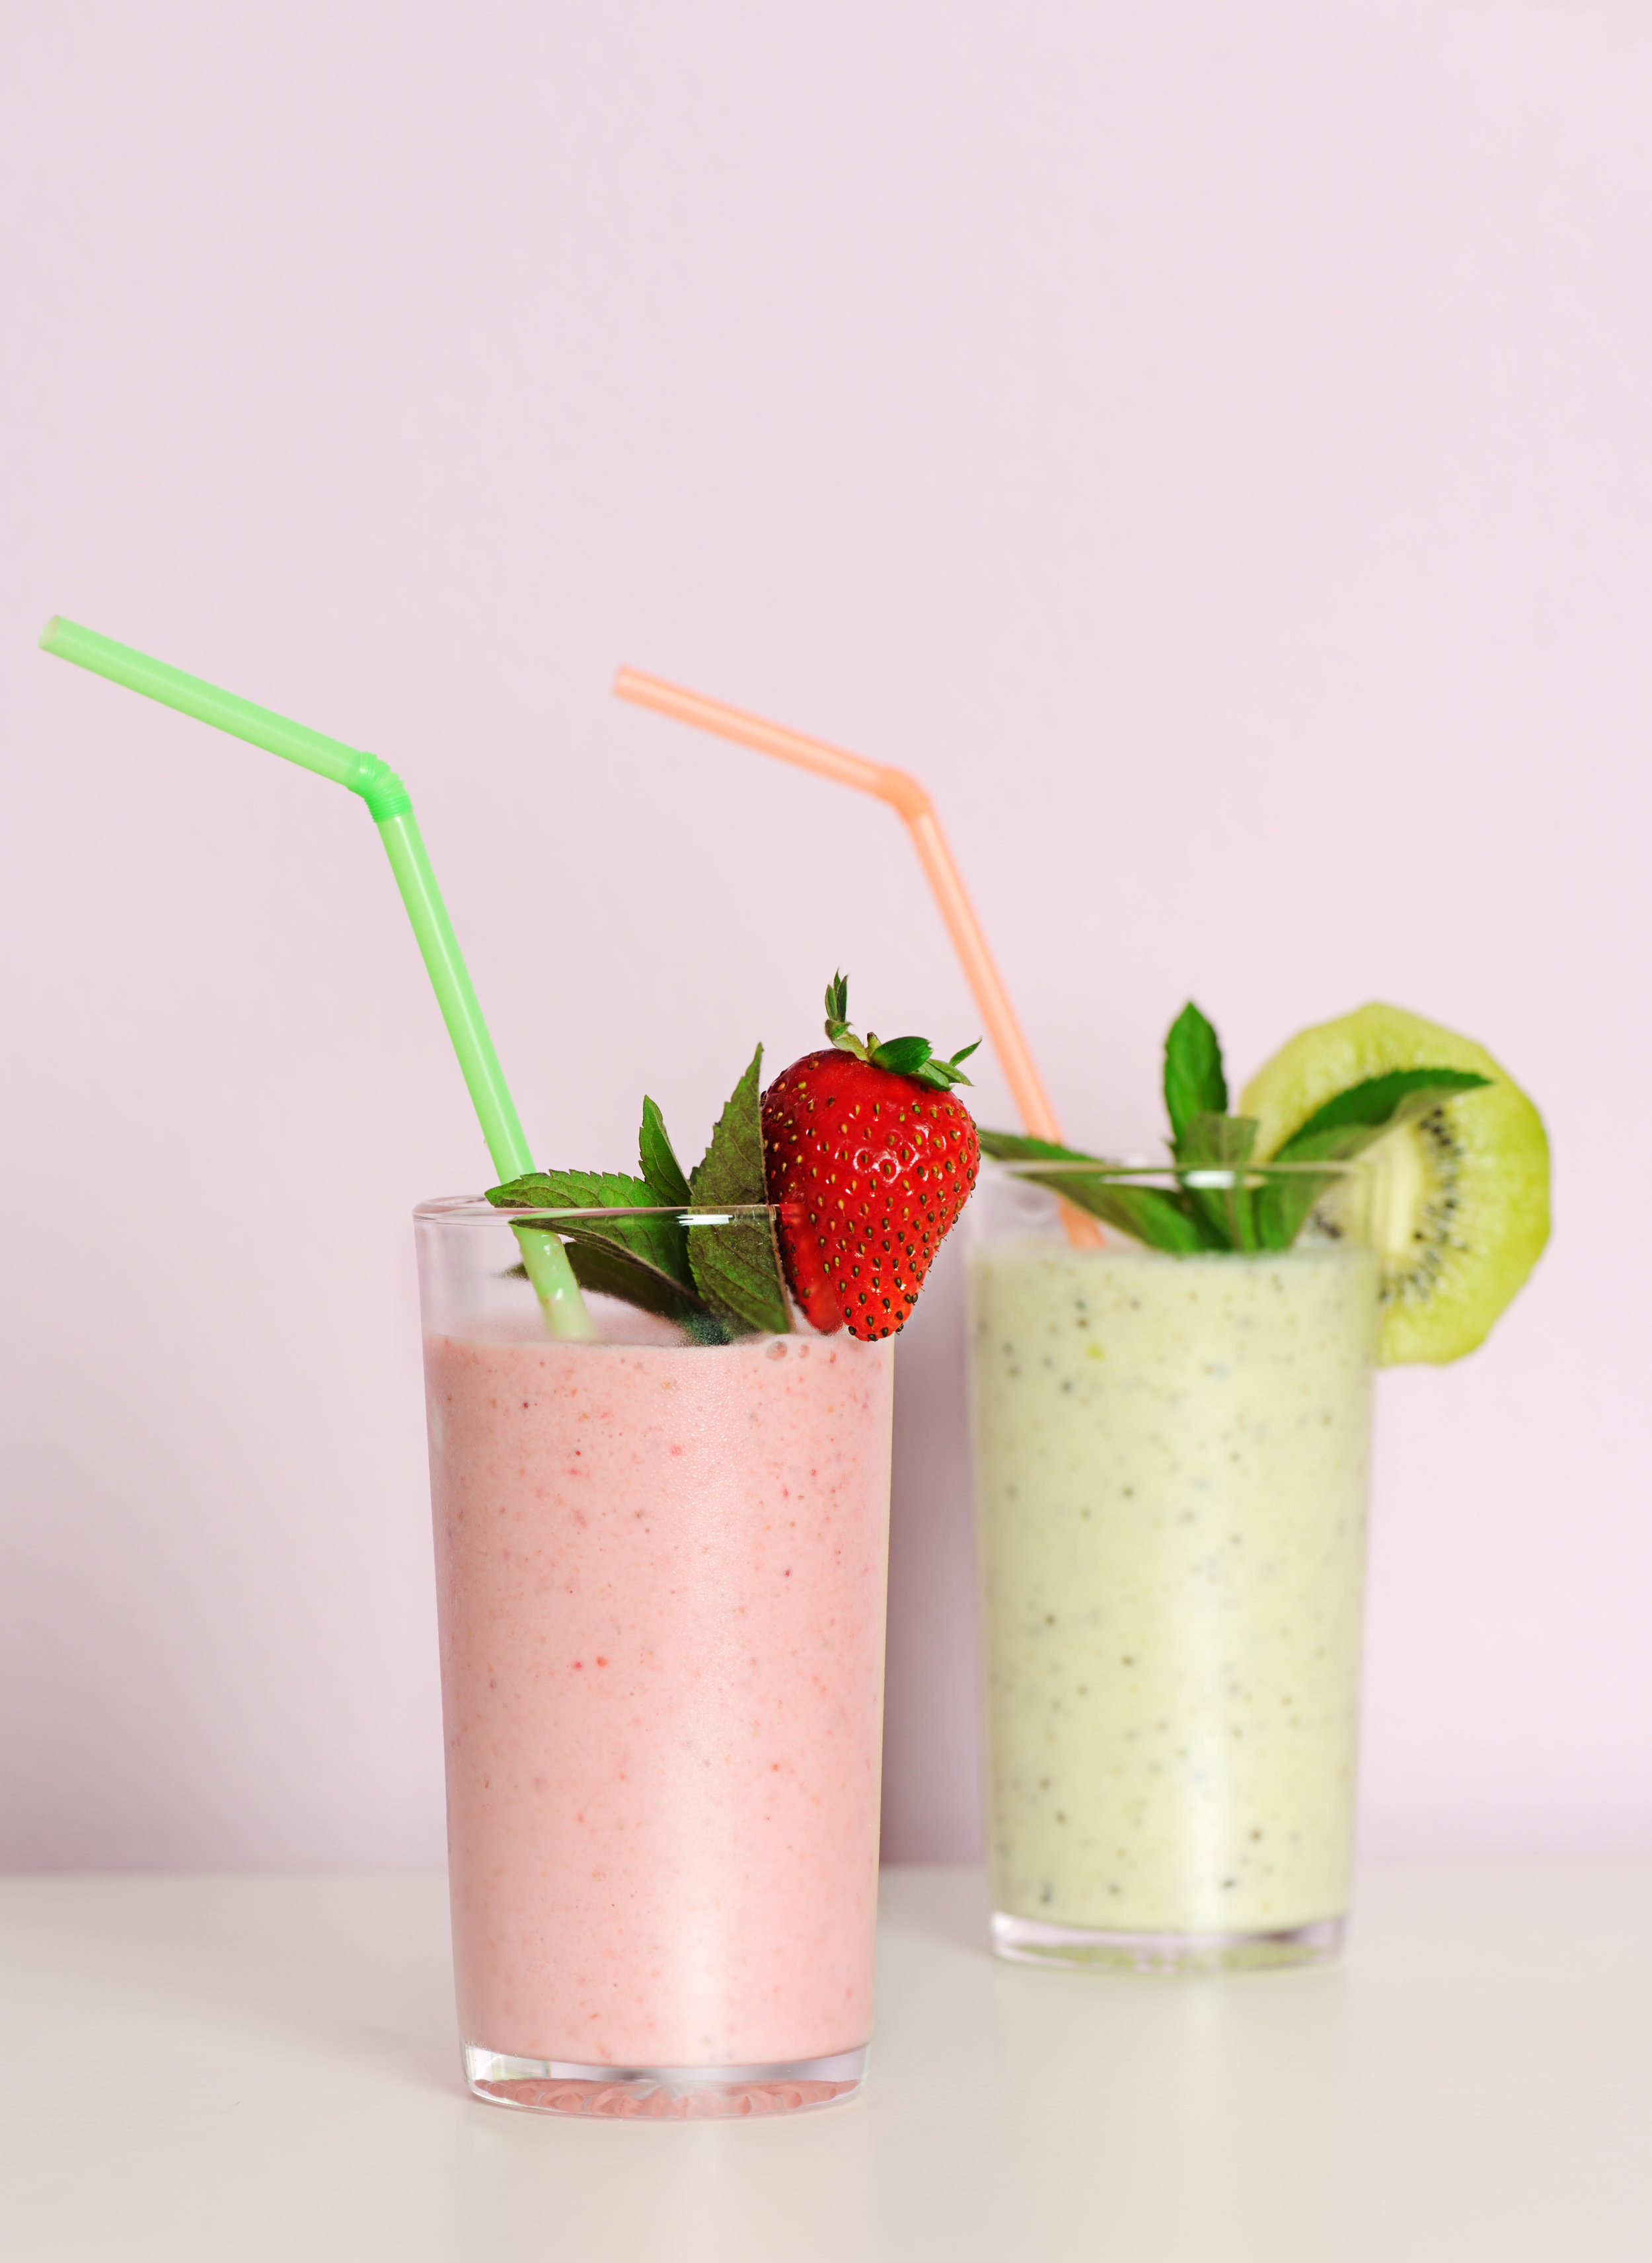 fruit-smoothies-PRLACCF.jpg